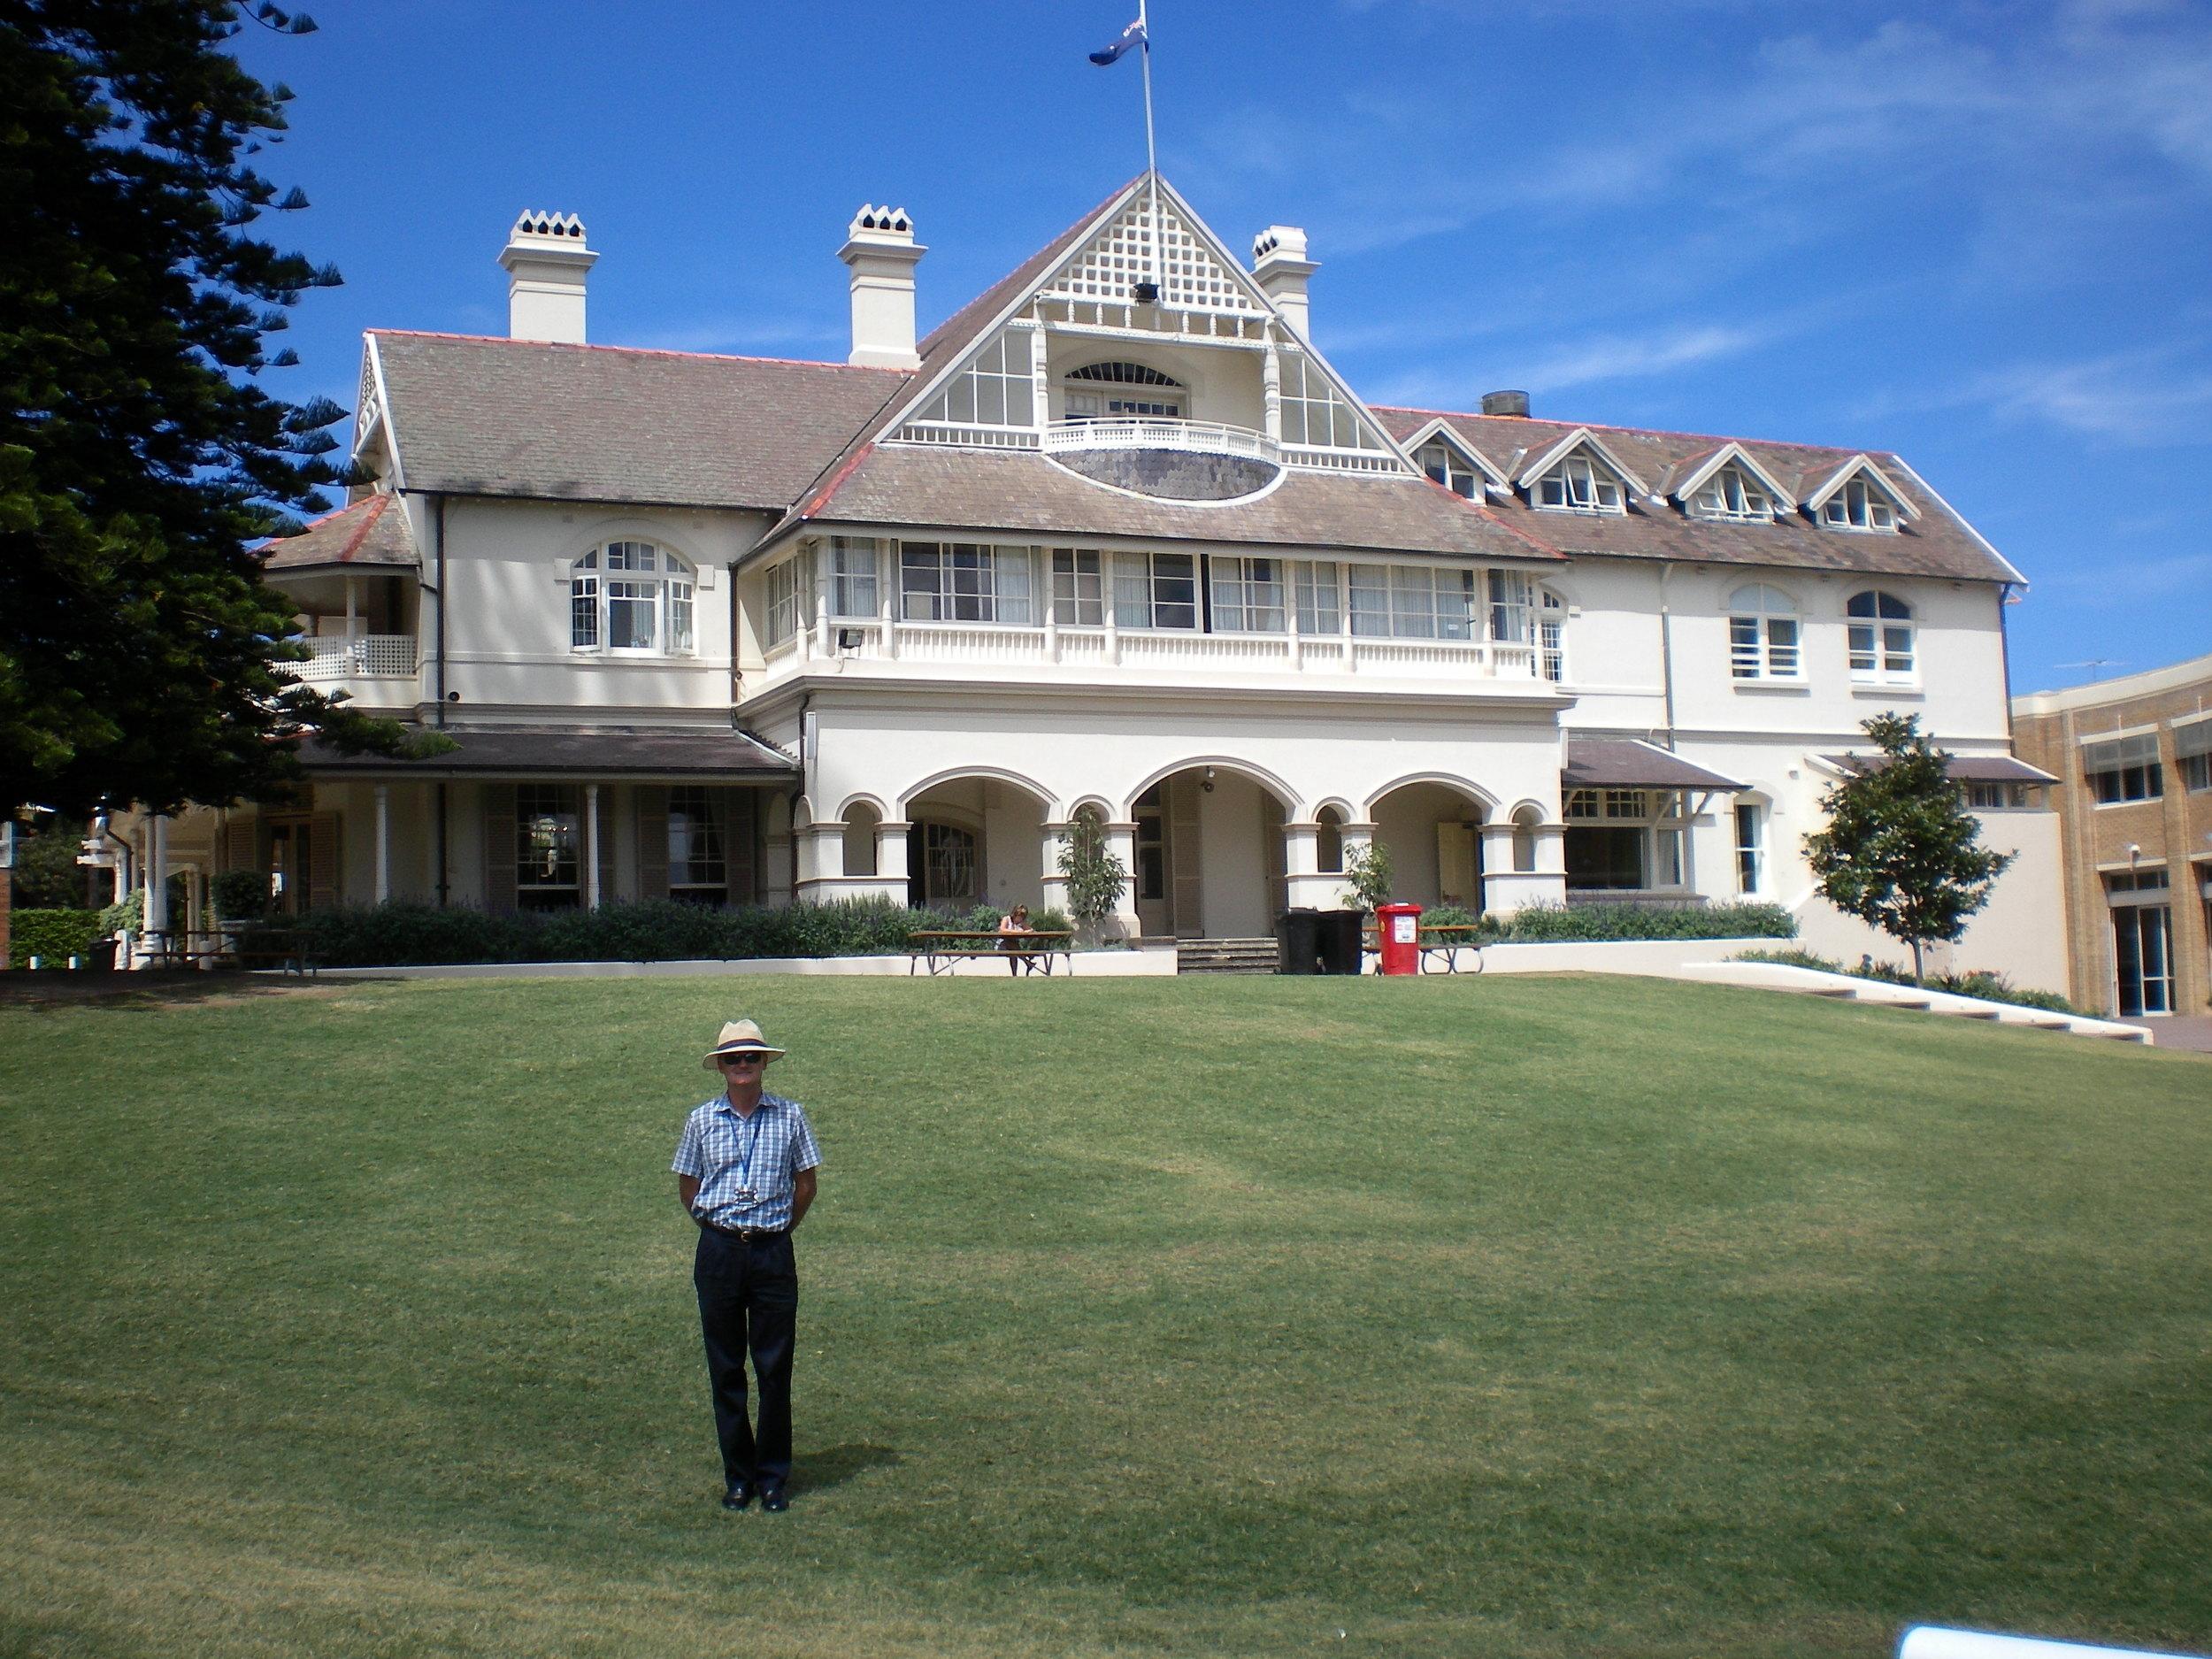 The lovely Kambala school.